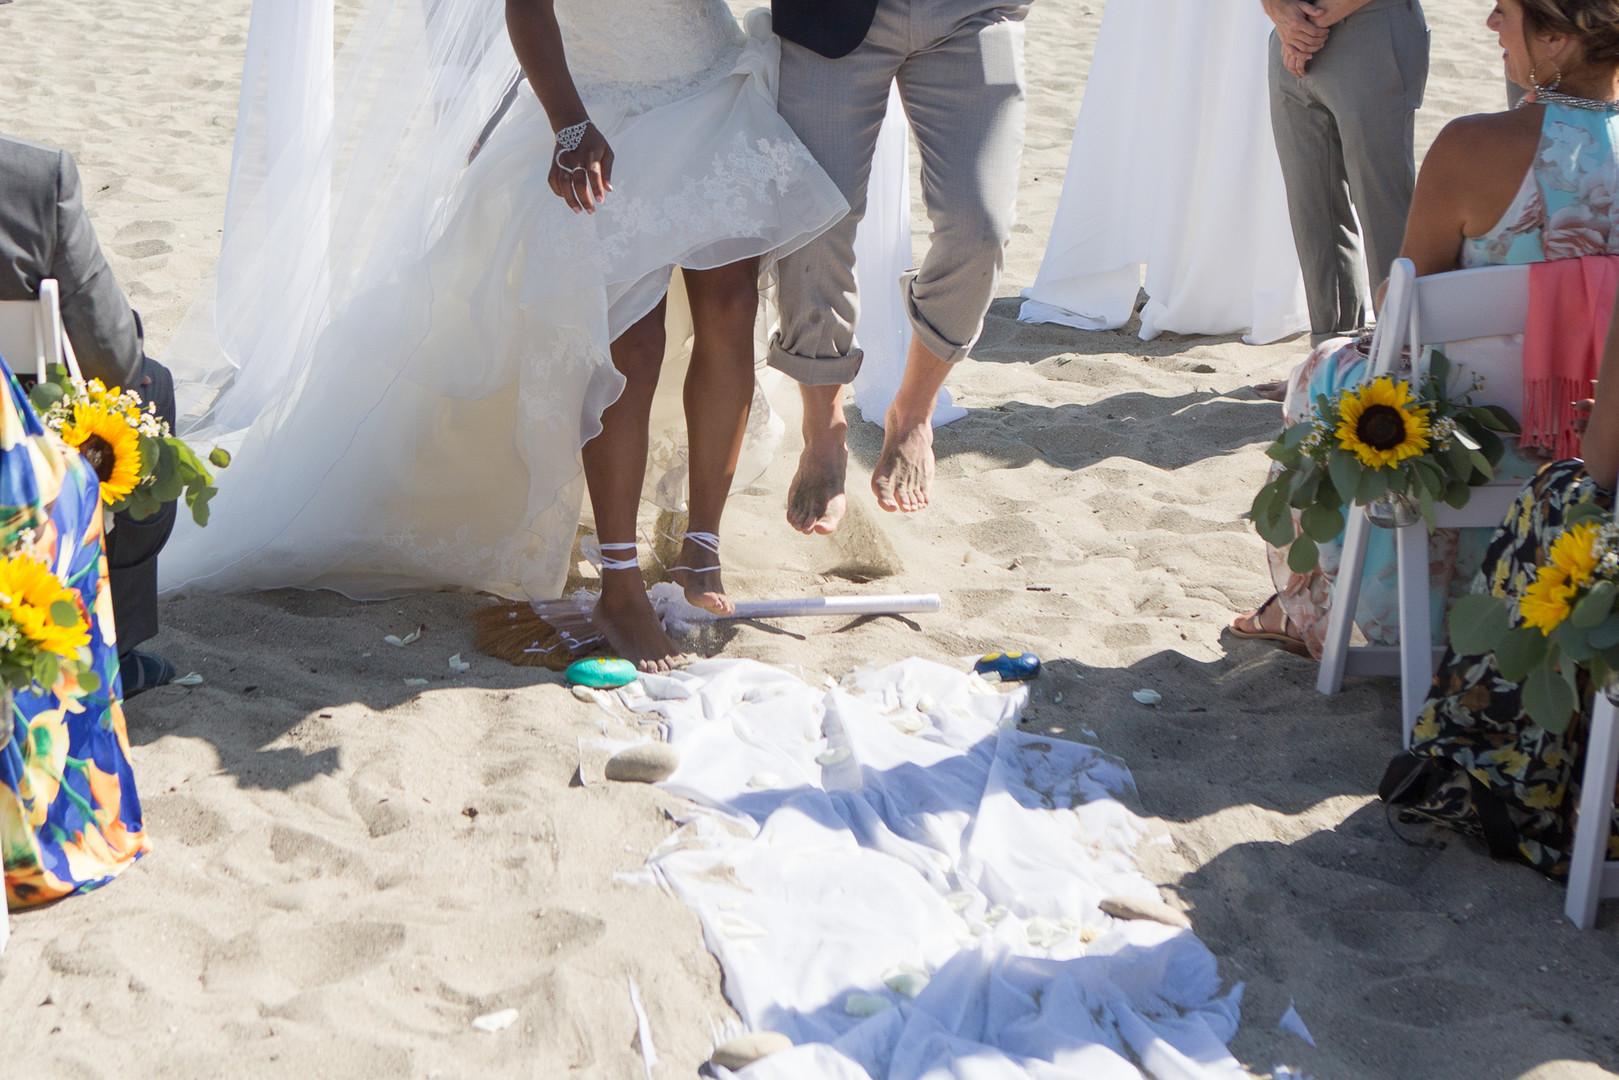 www.santabarbarawedding.com | Renoda Campbell | Weddings by Bobbie | Ventana Grill Events | Ceremony